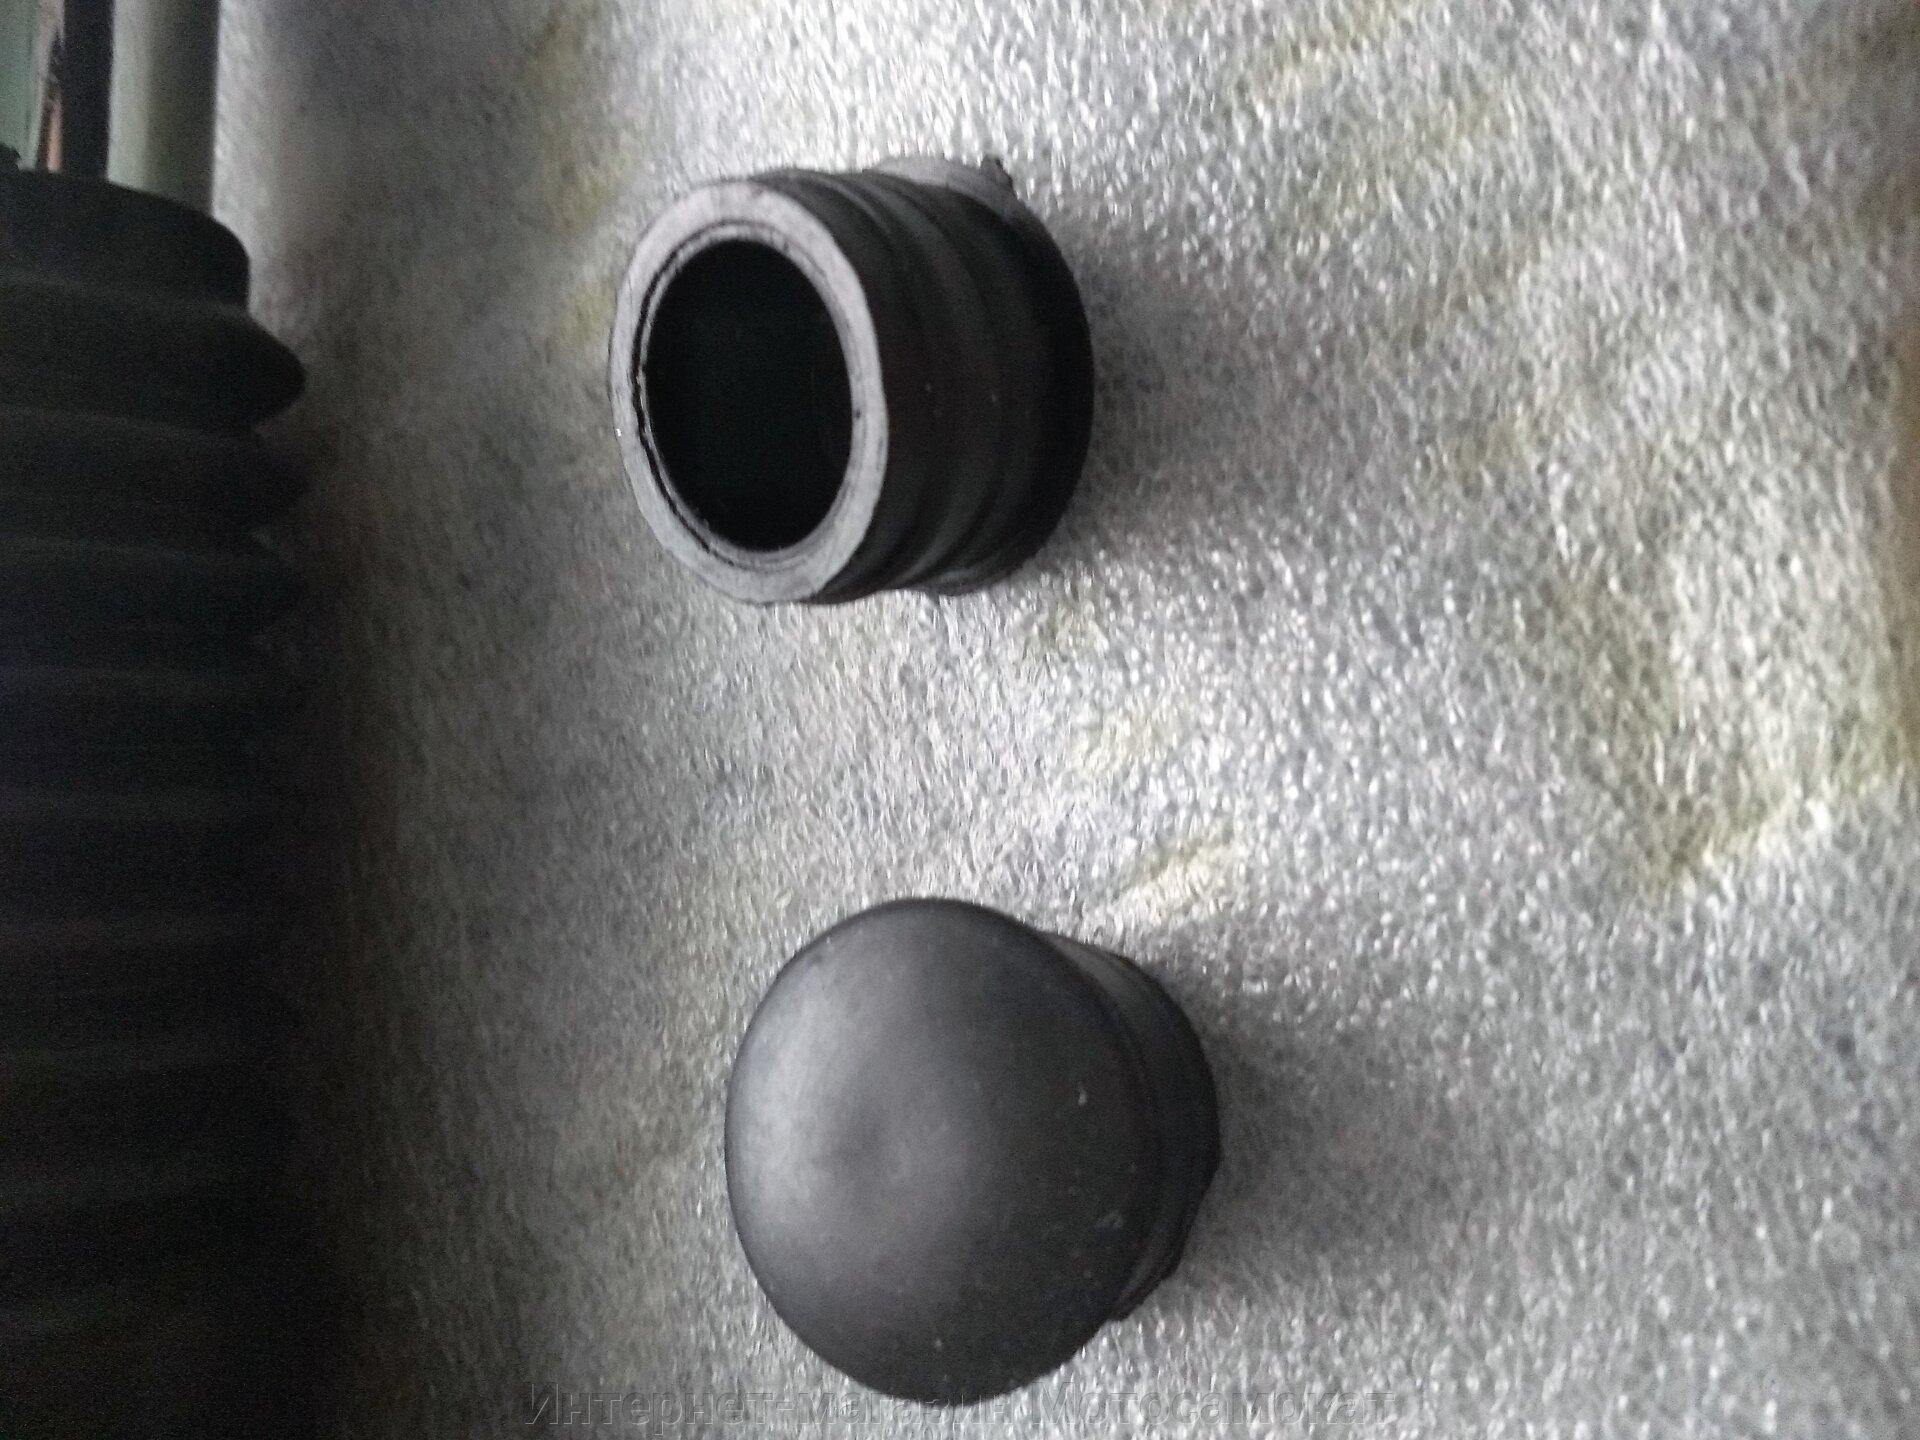 Передняя пружинная вилка для электросамокатов RHINO/ EVO/ E-SAMOKAT/ WINDEXPERT/ E-scooter - ES16(17)-500(800/1000)